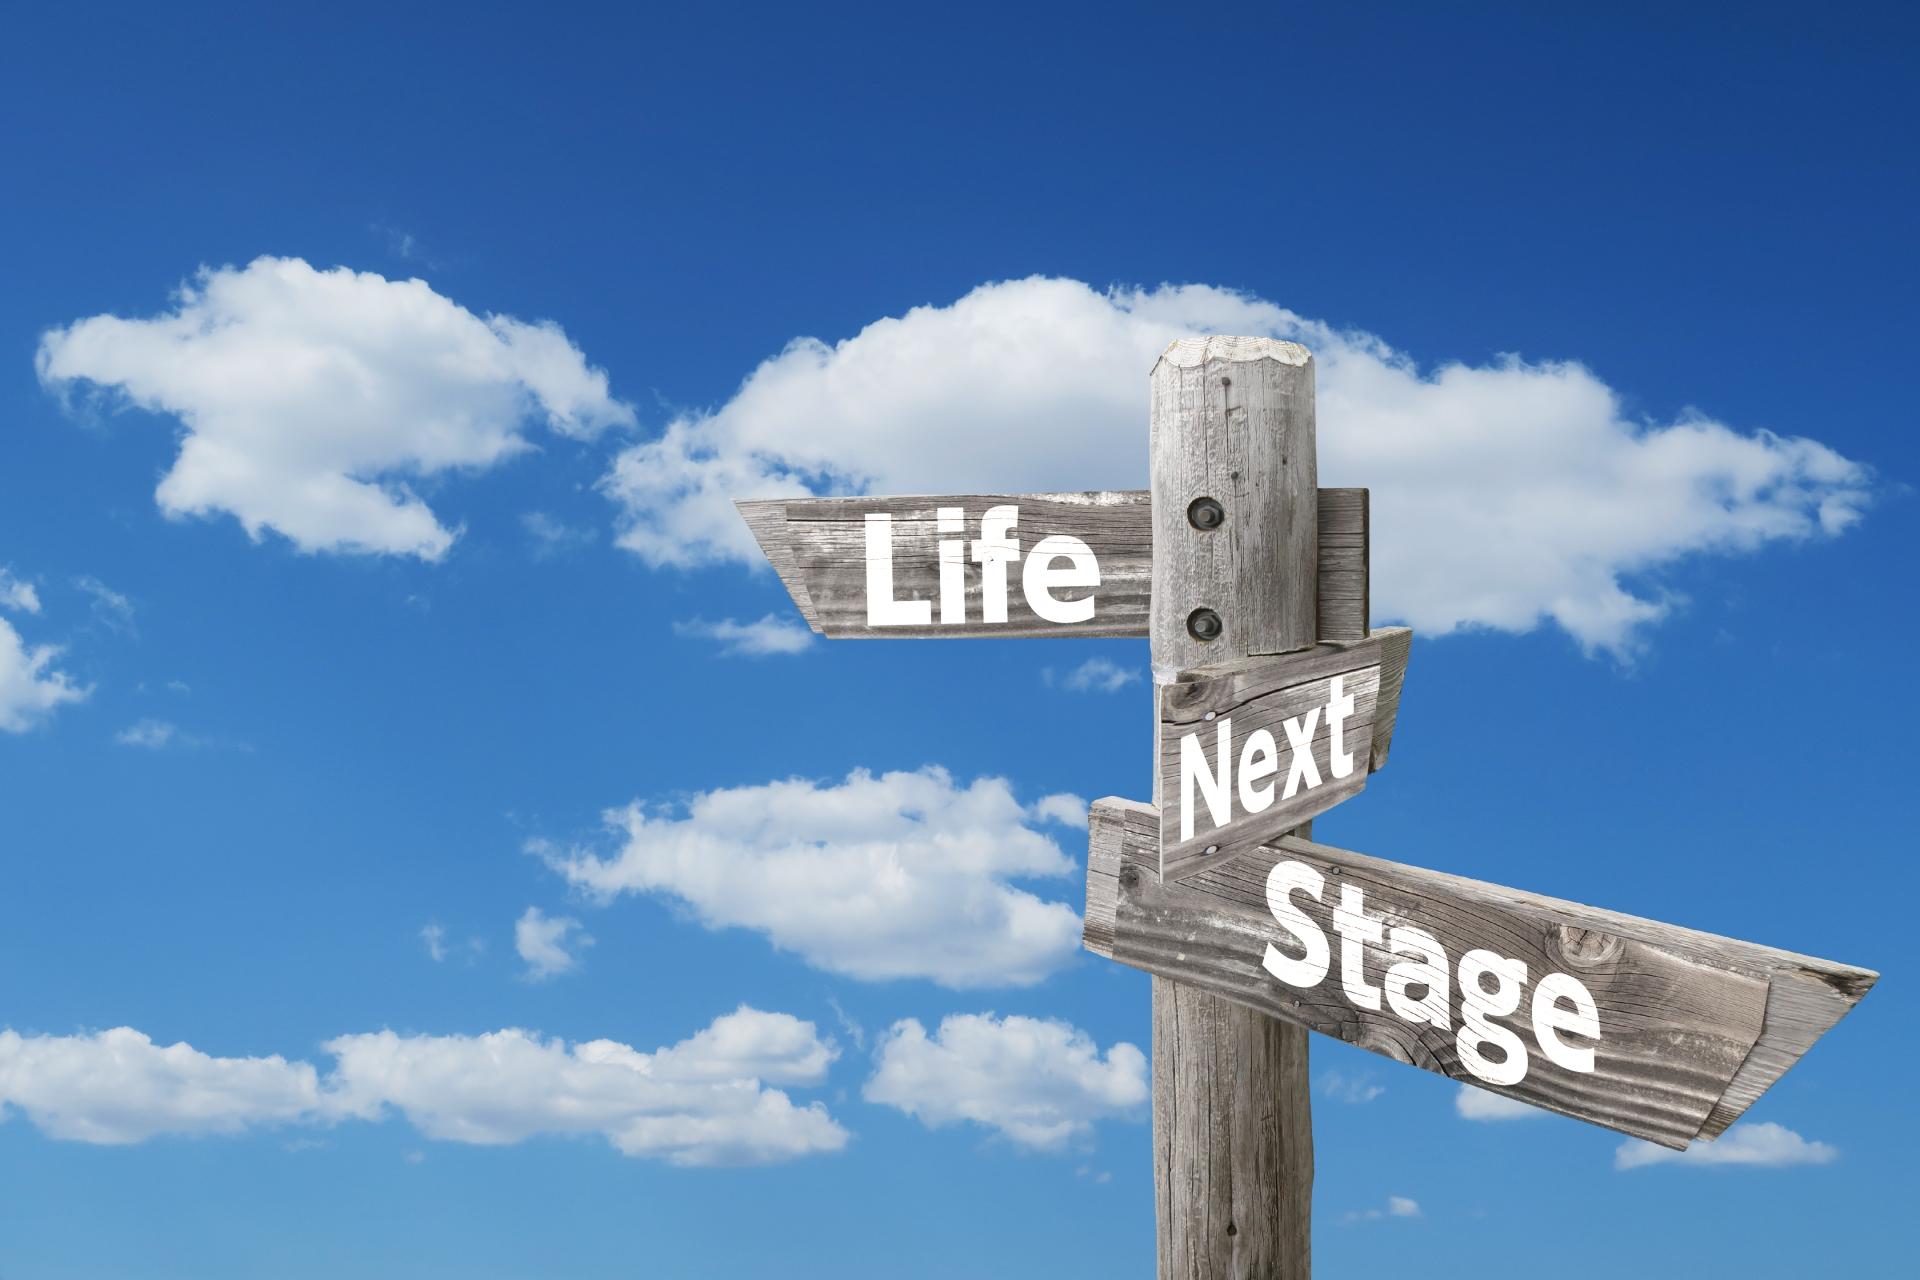 Life Next Stage